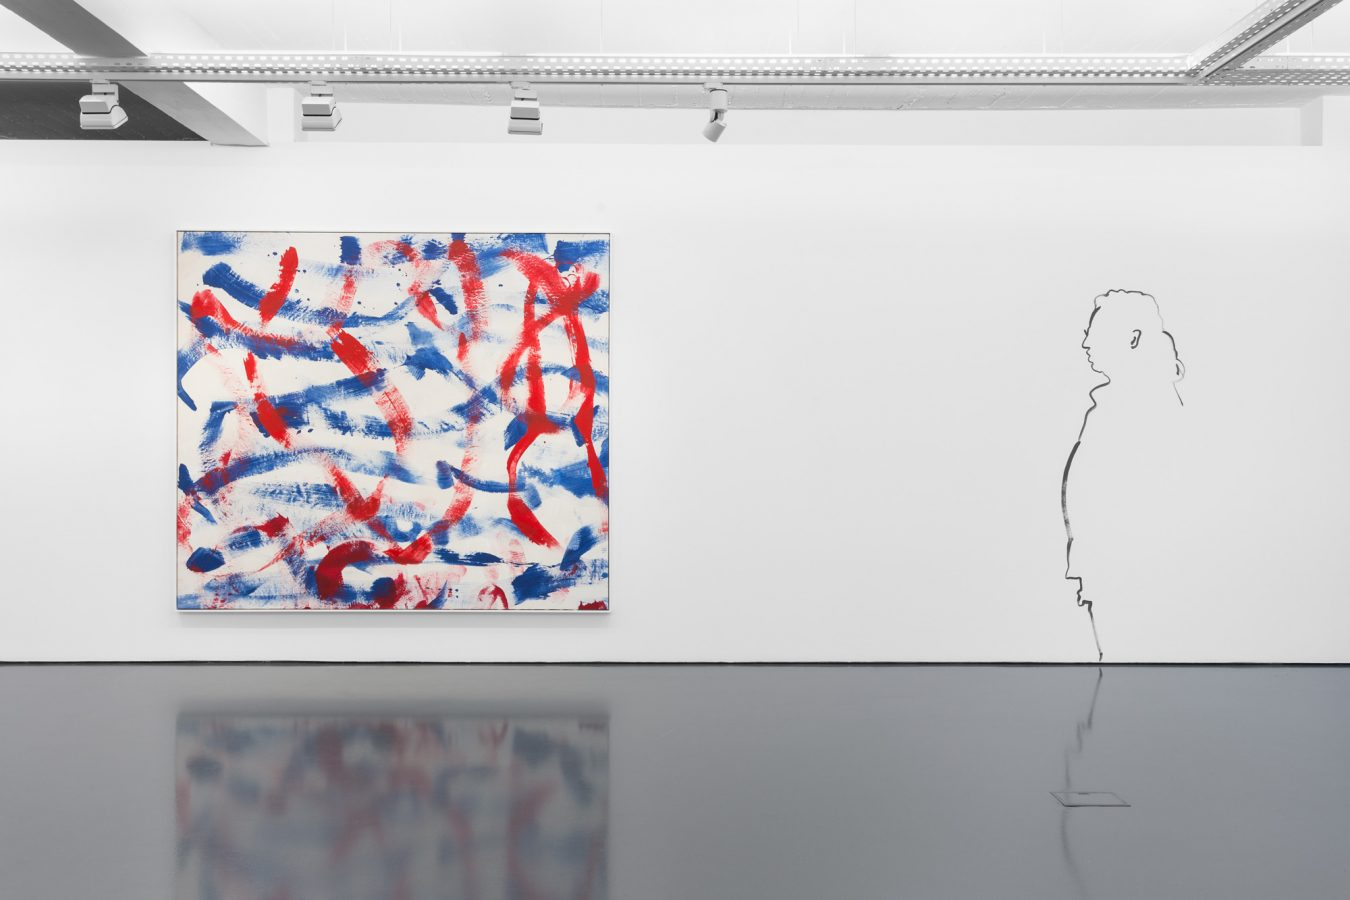 Galeria Pedro Cera – Vítor Pomar - Spontaneous Fruition